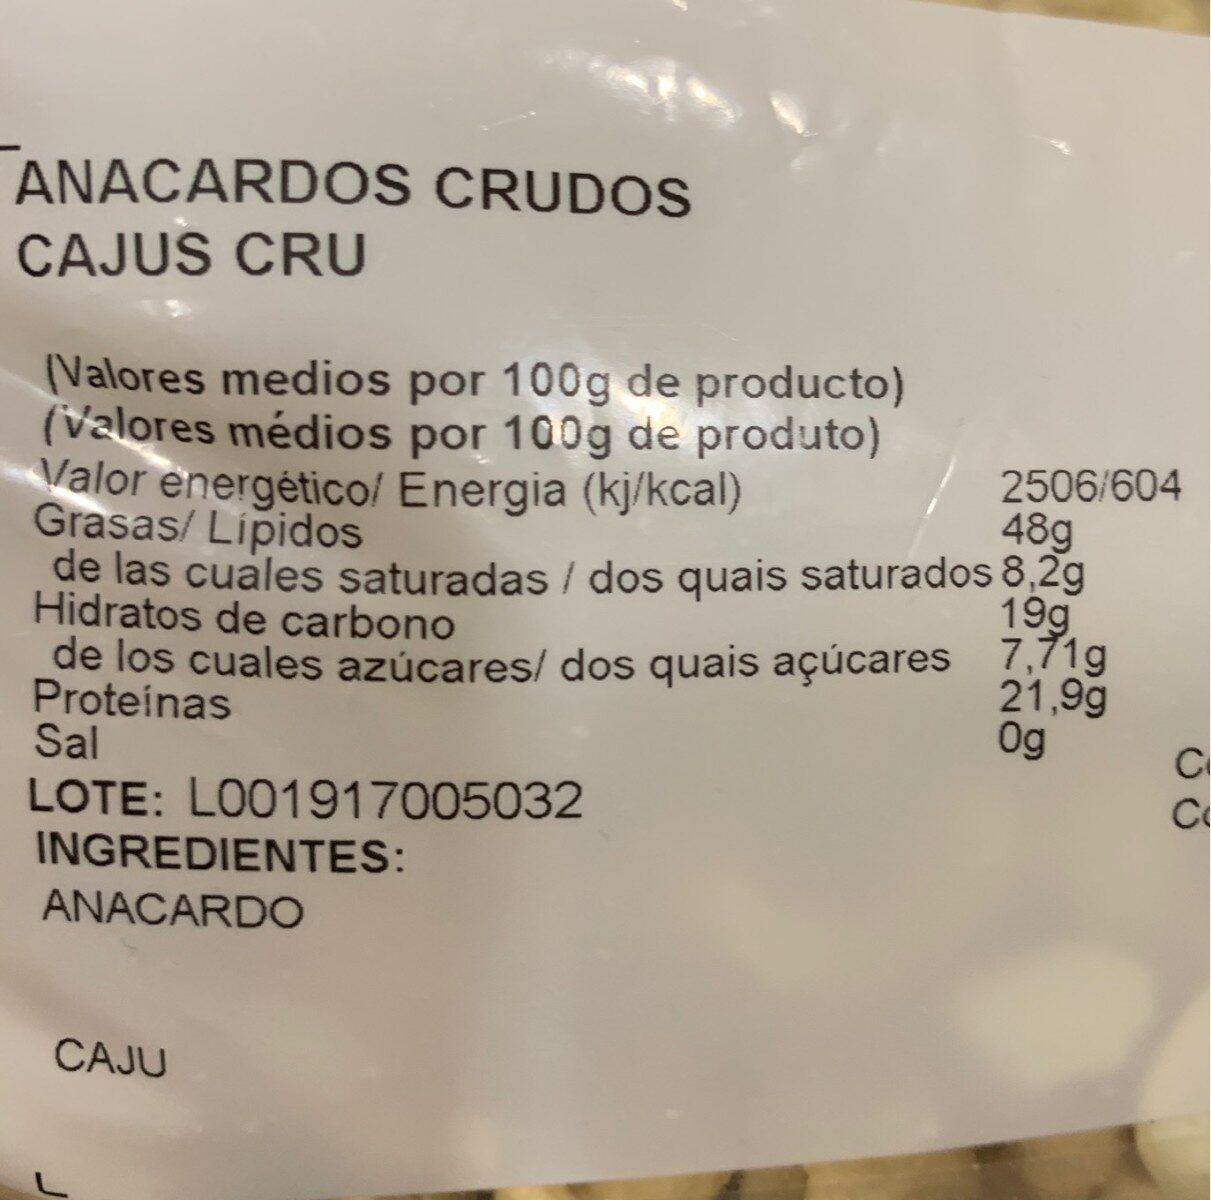 Anacardos crudos - Información nutricional - es